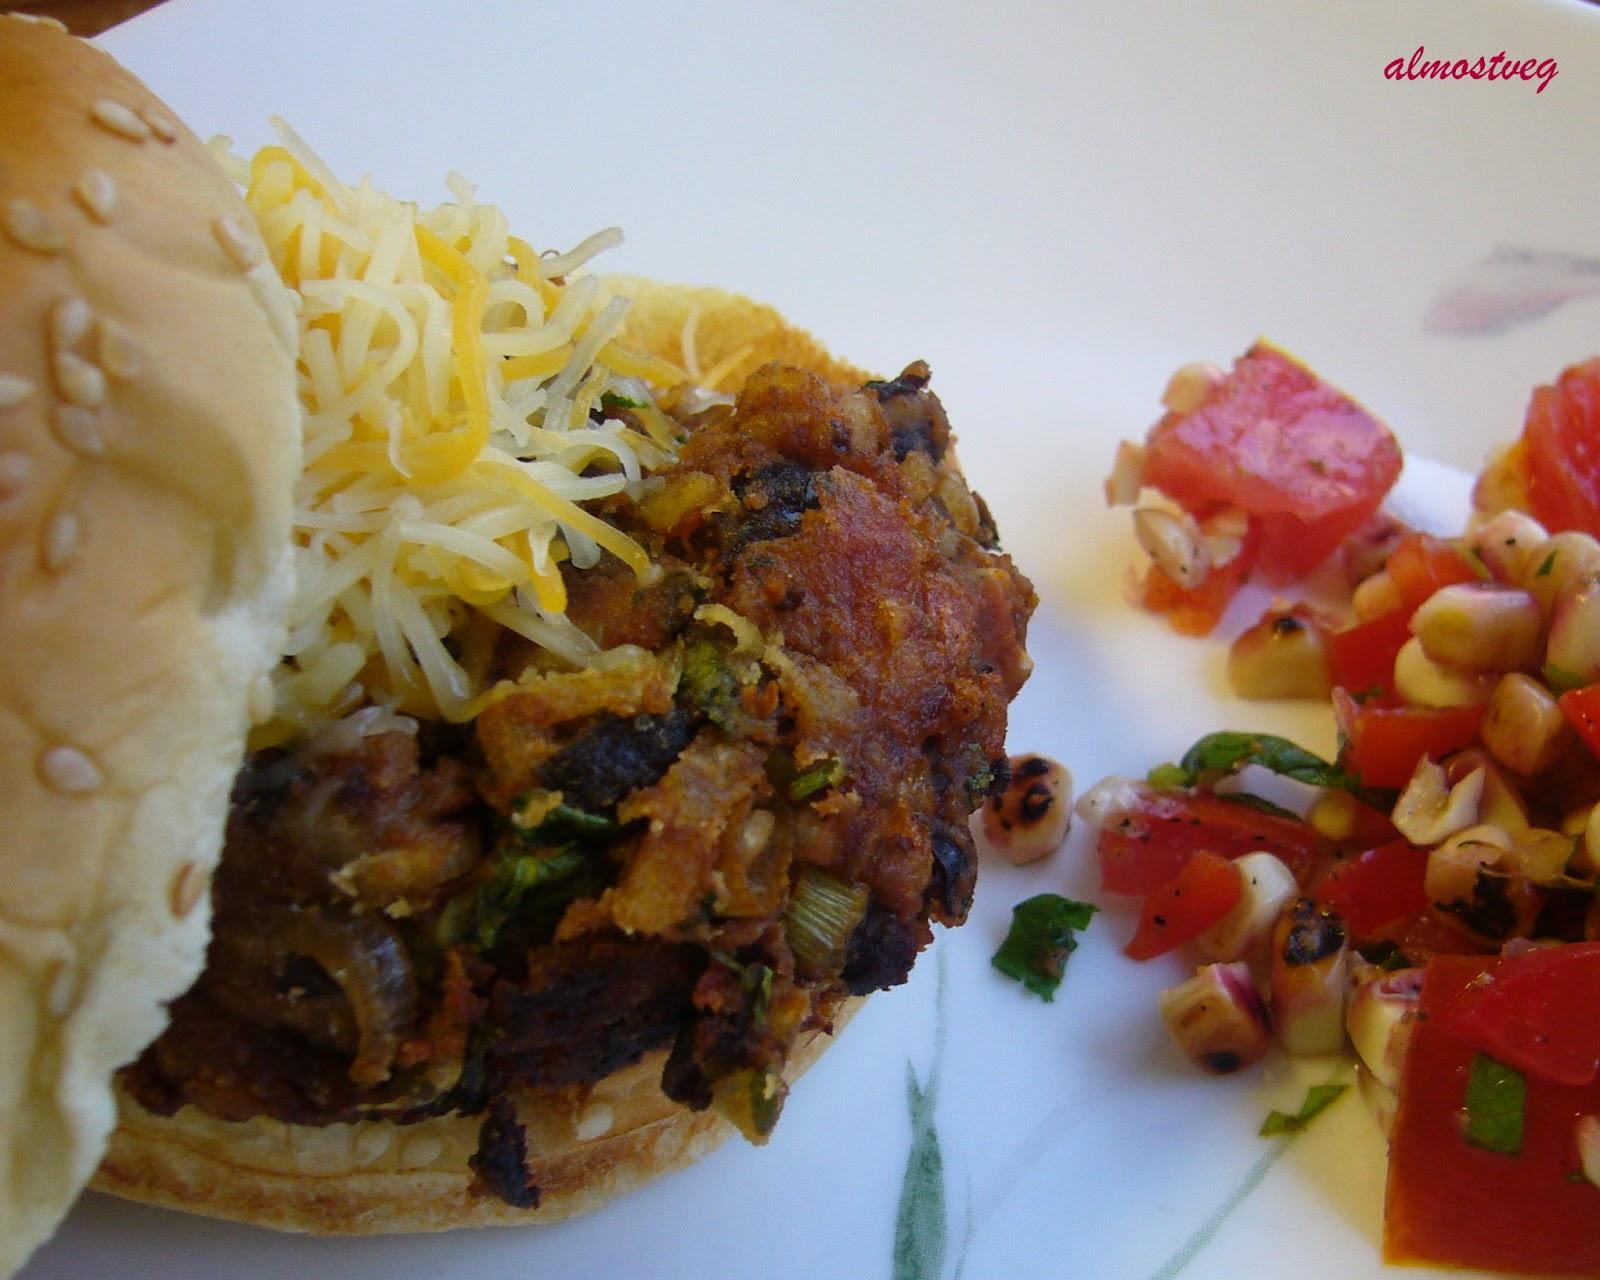 almostveg: Black bean and brown rice burger